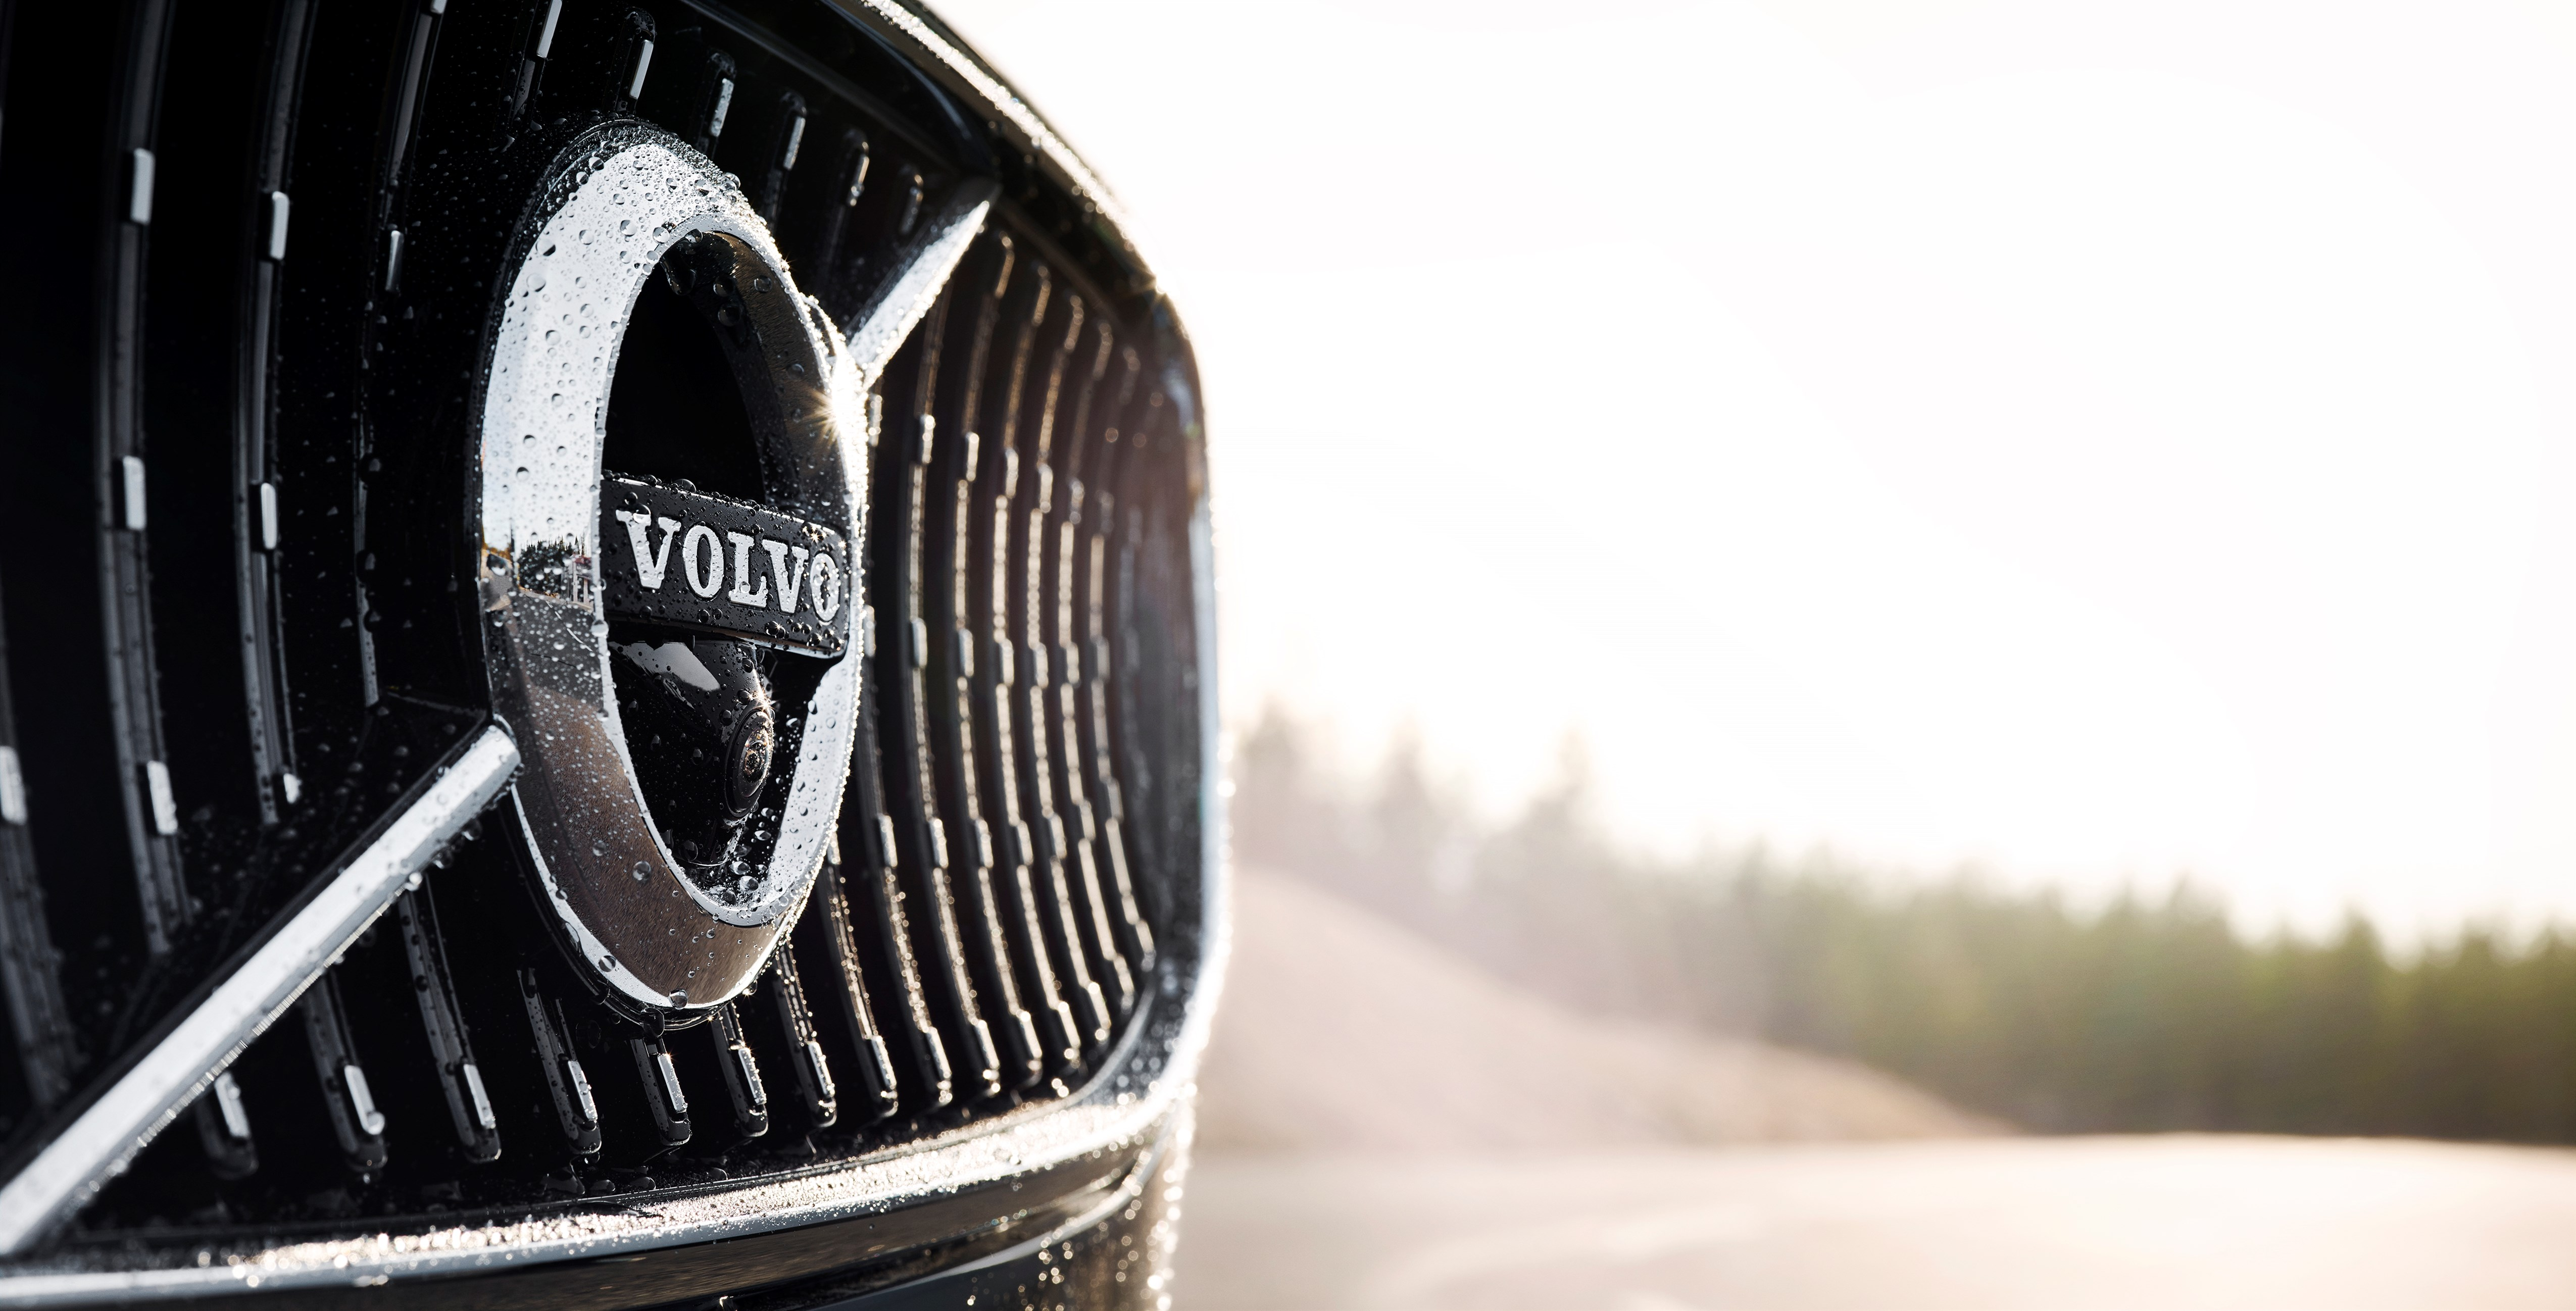 Talleres Volvo Gresalba